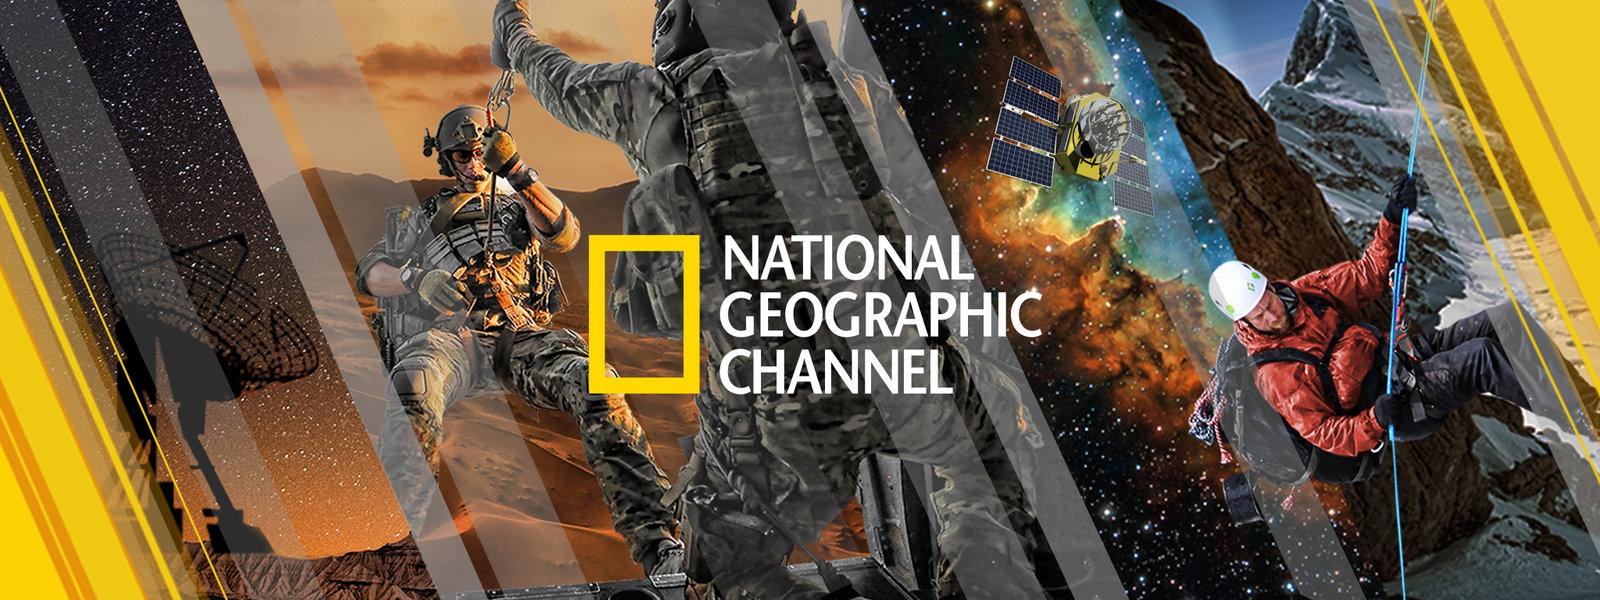 HIGHLIGHTS PALINSESTI DI MARZO 2016 NATIONAL GEOGRAPHIC